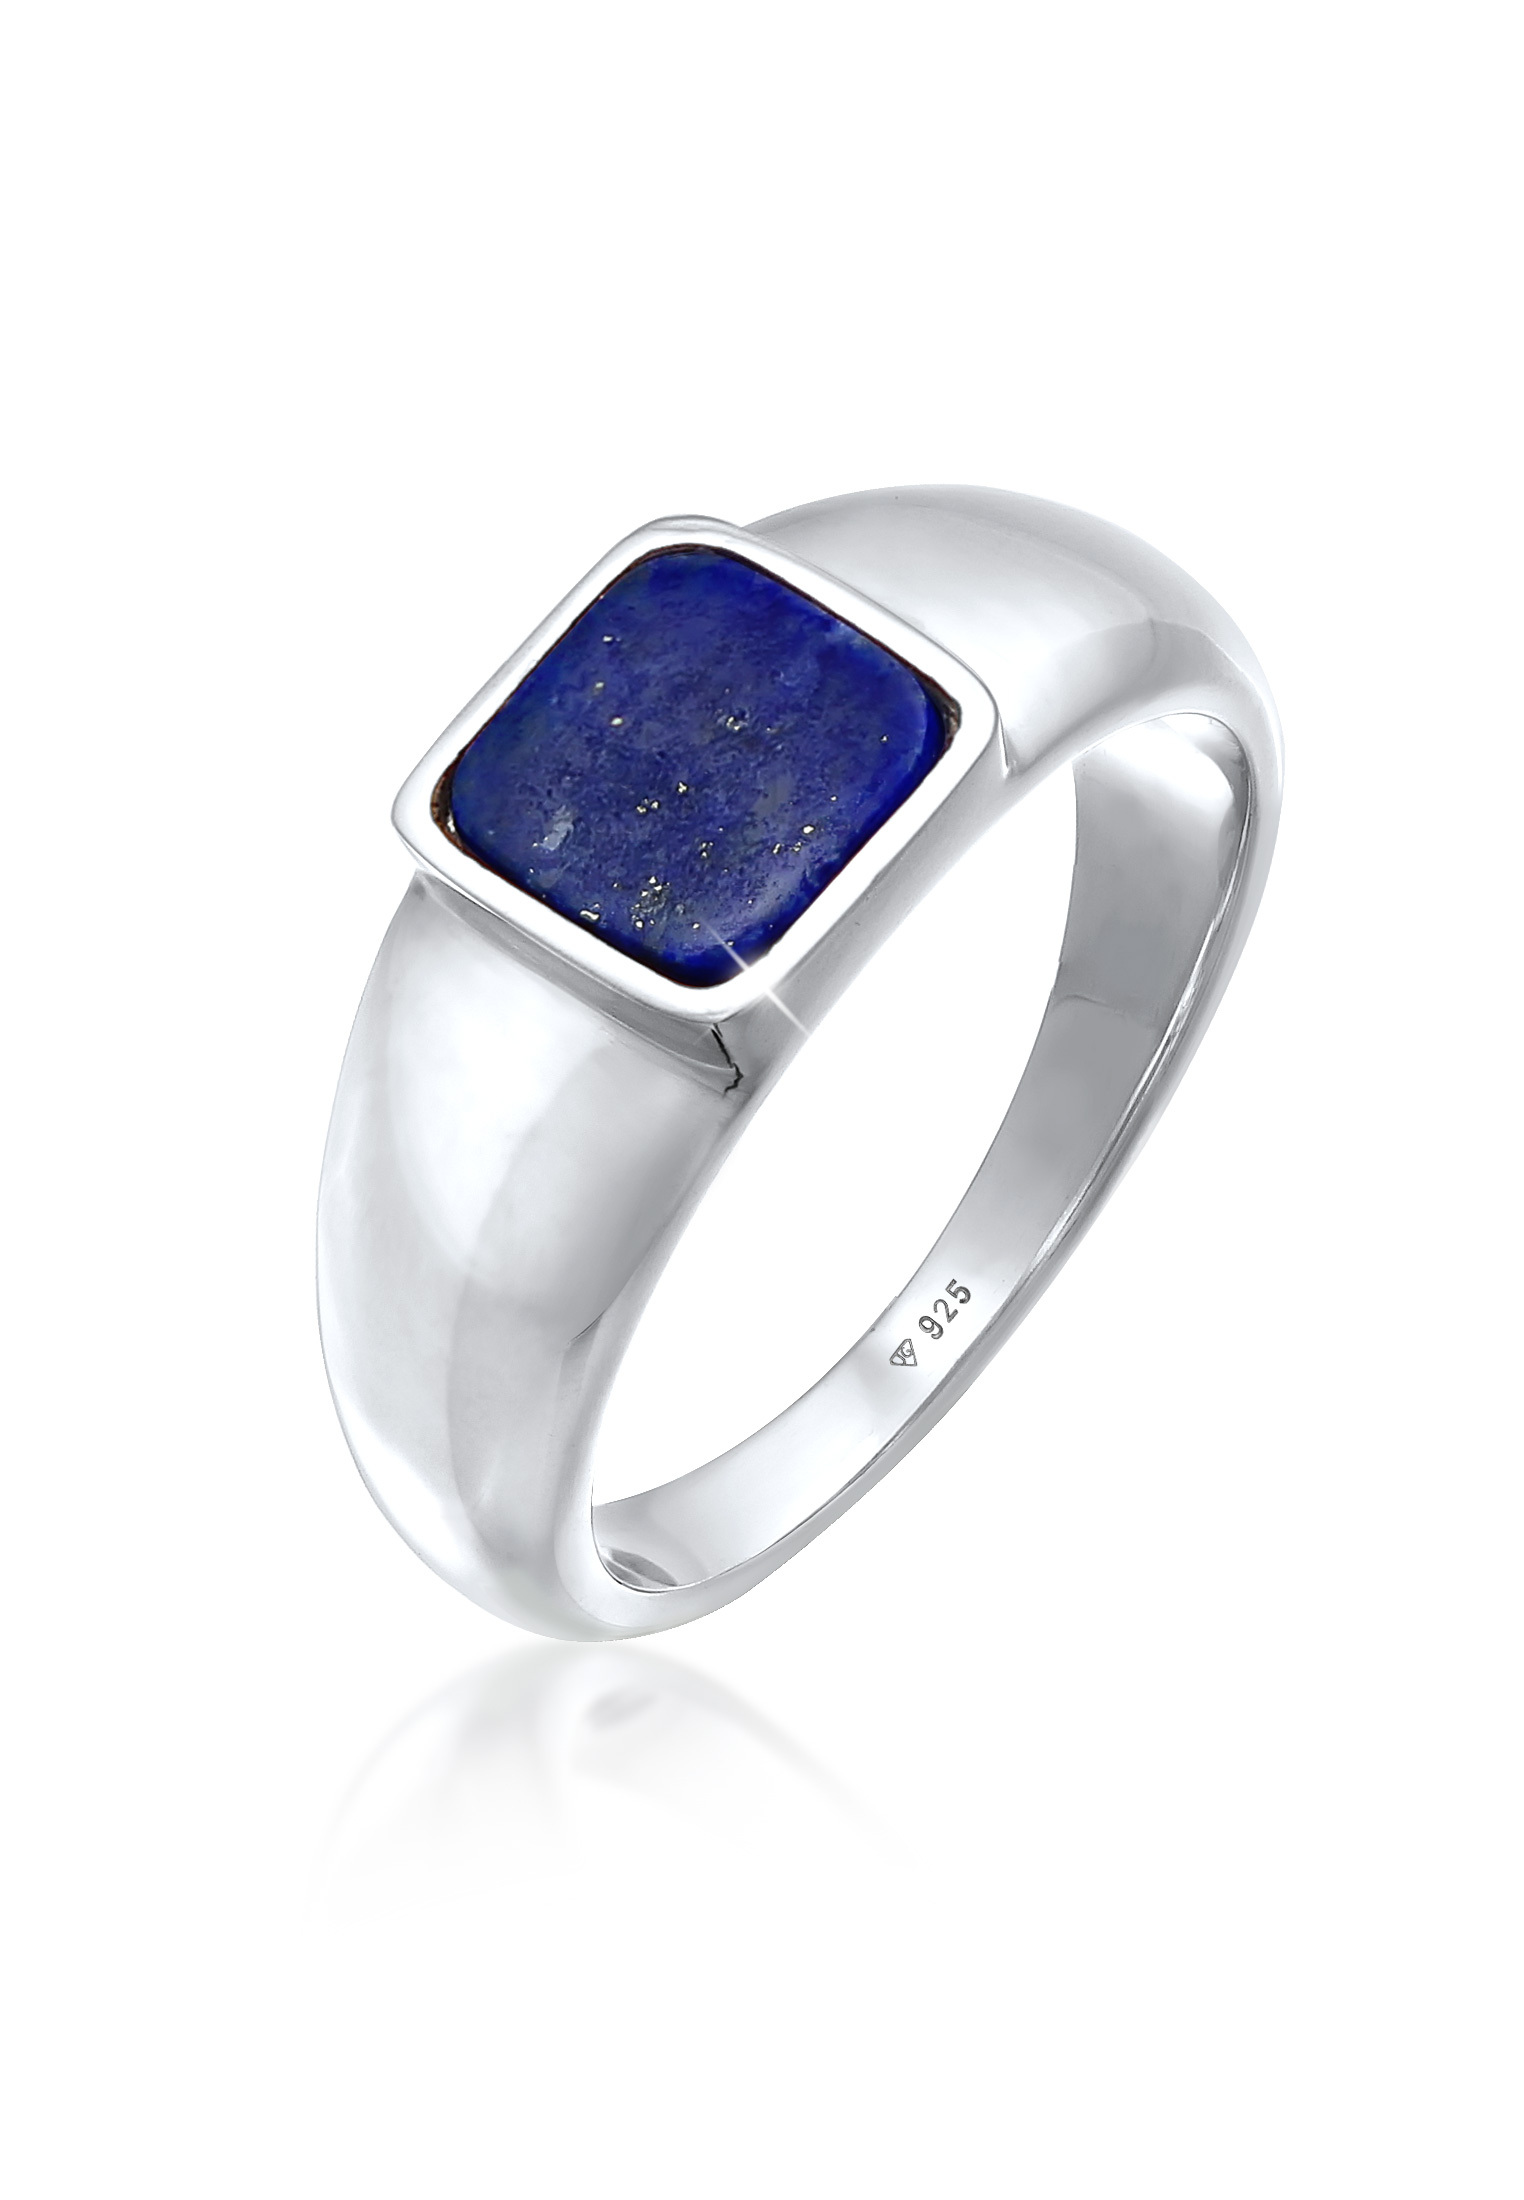 Siegelring Quadrat   Sodalith (blau)   925er Sterling Silber